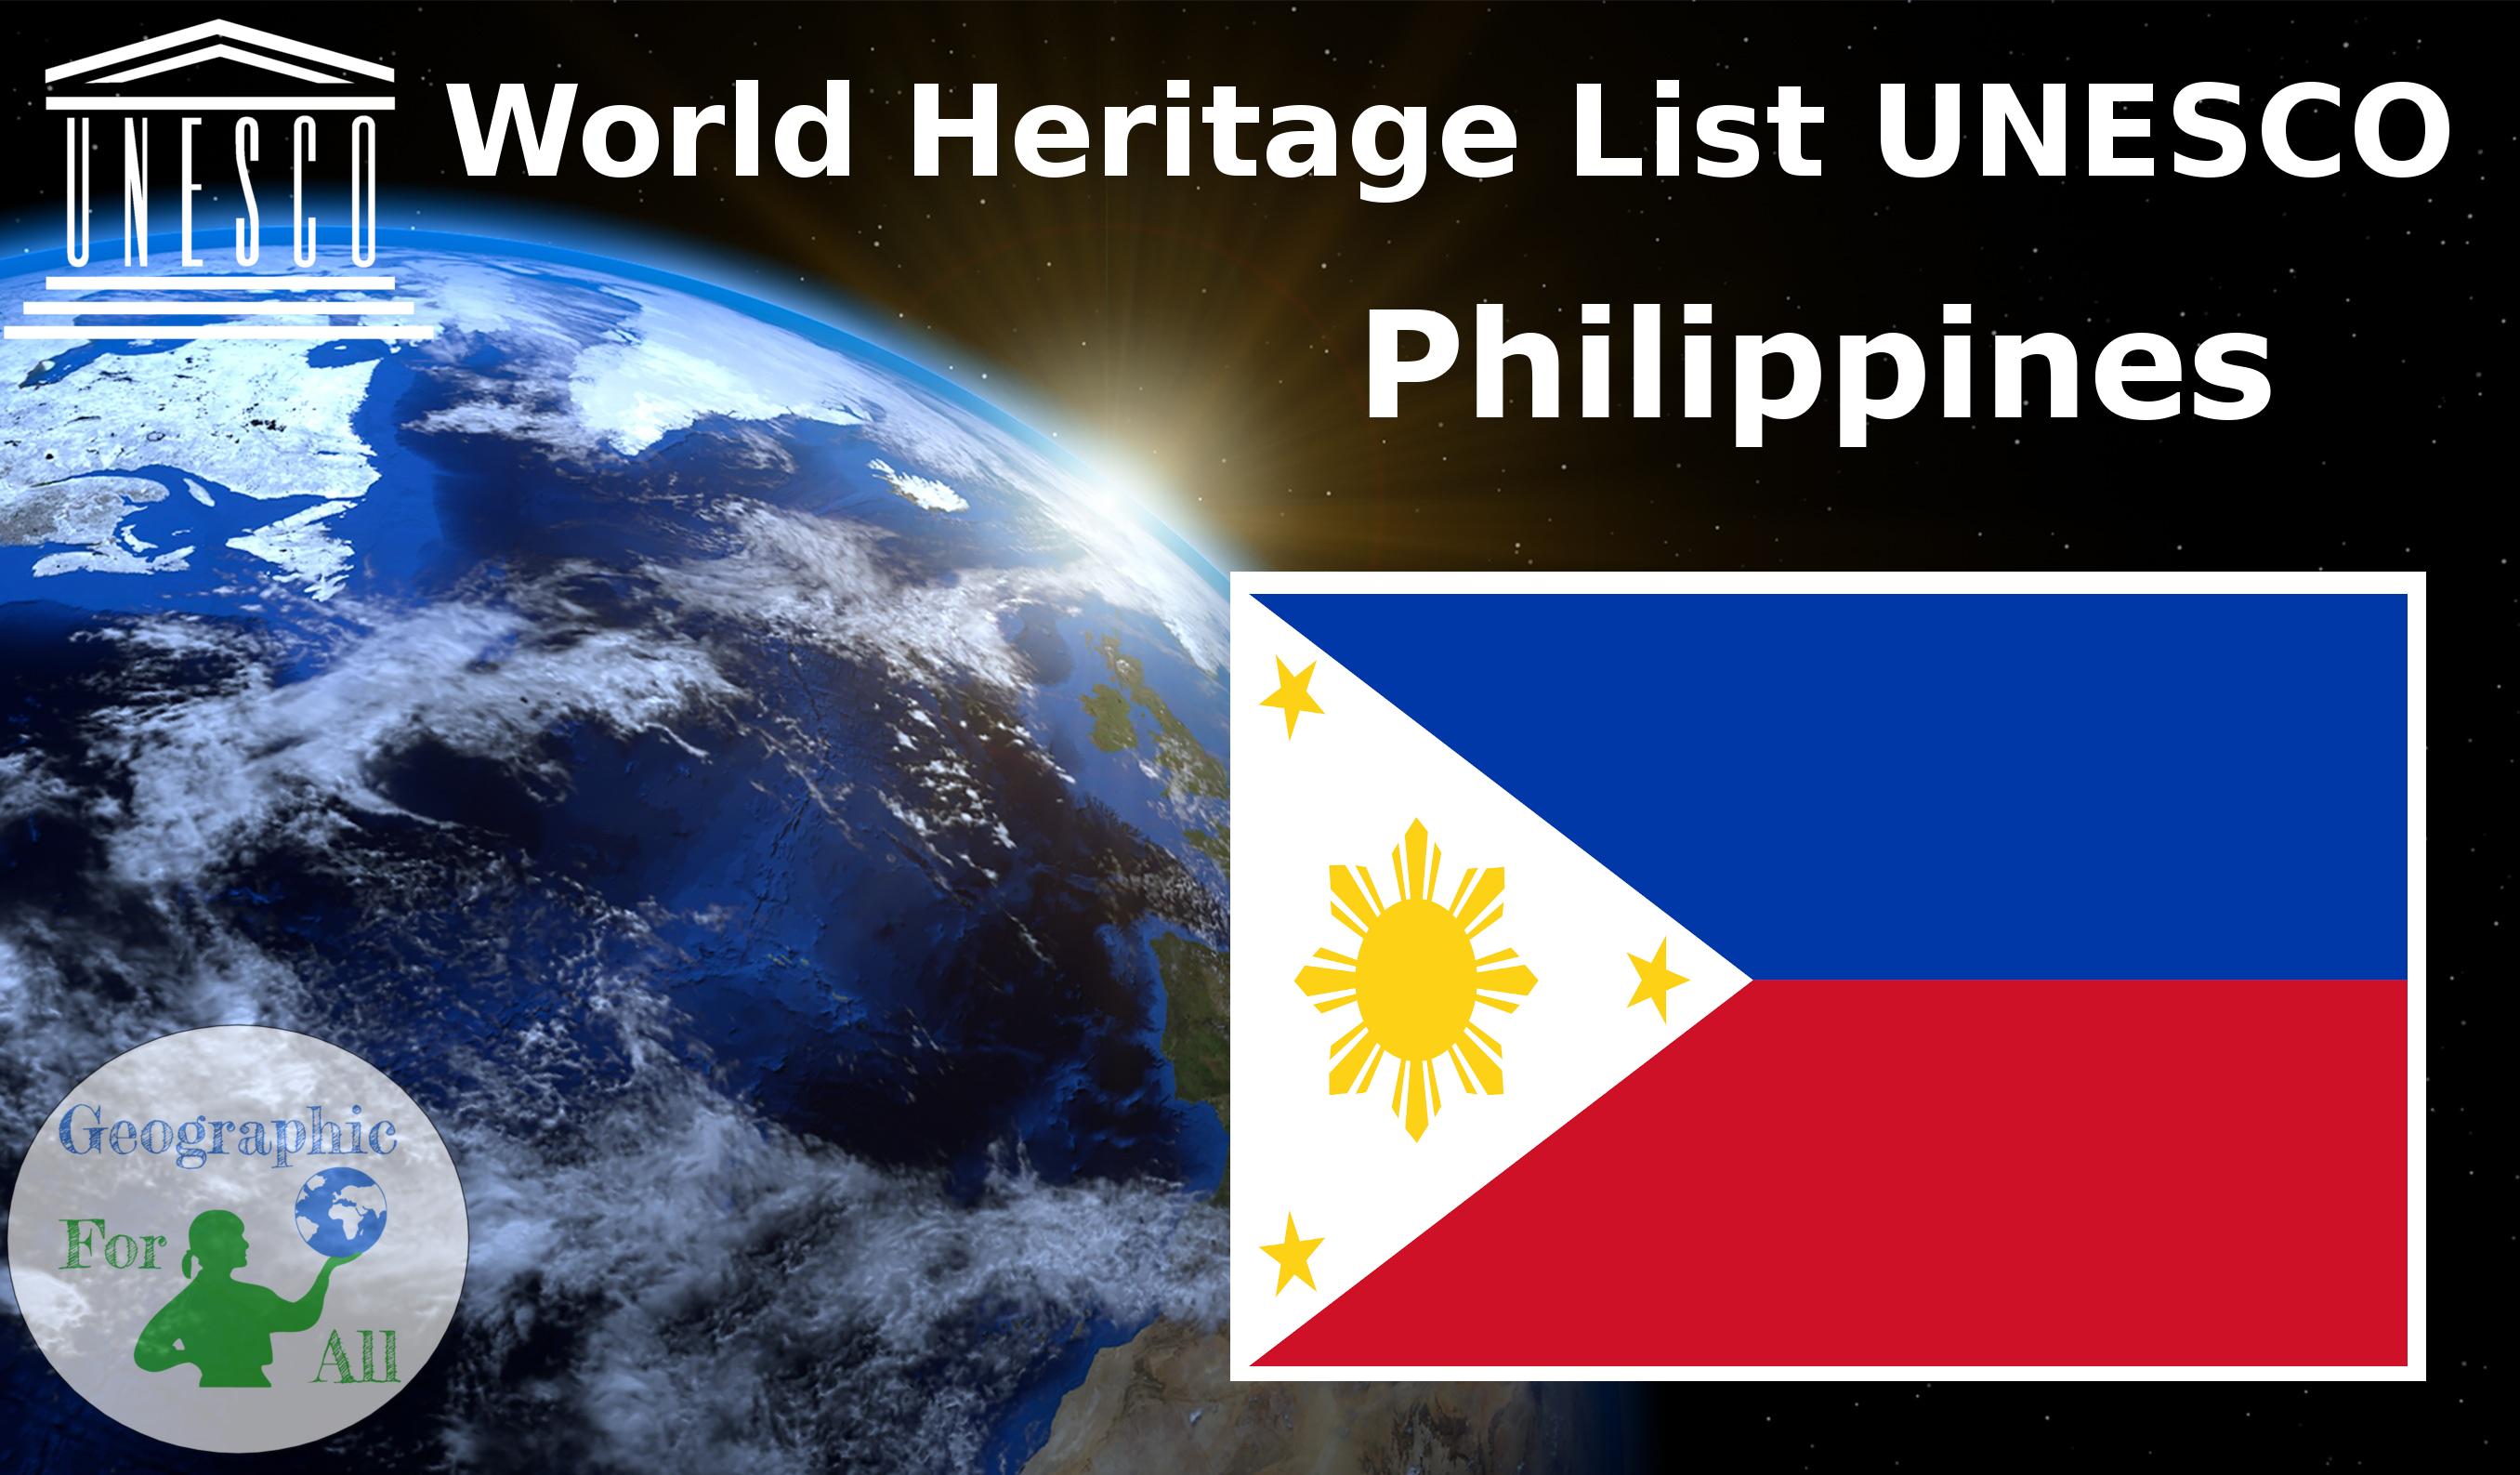 World Heritage List UNESCO - Philippines